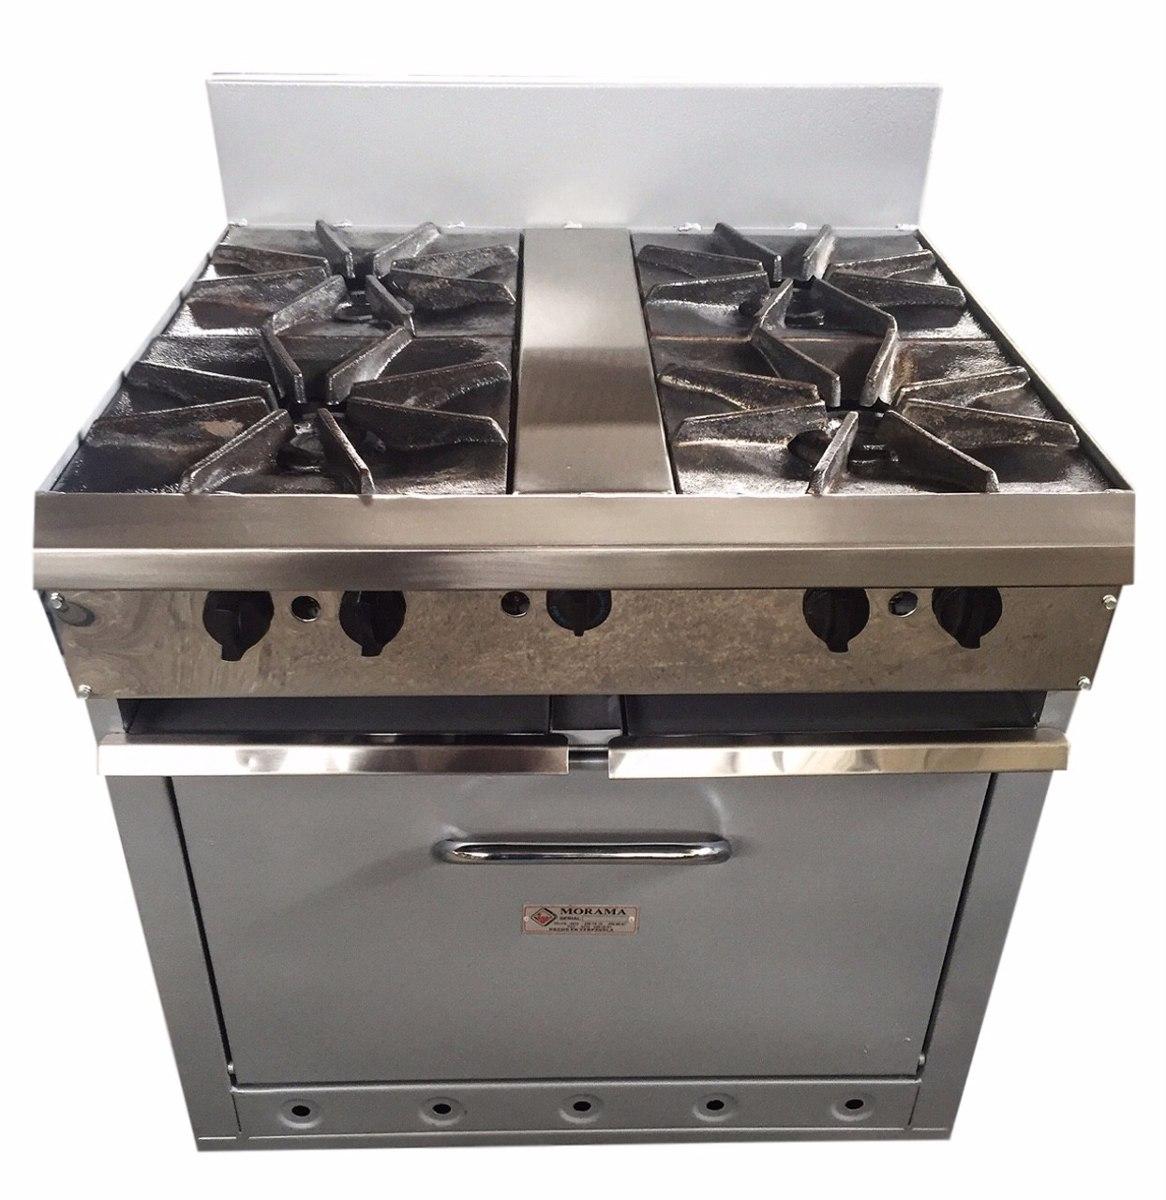 Cocina industrial 4 hornillas con horno morama bs - Cocinas industriales usadas ...